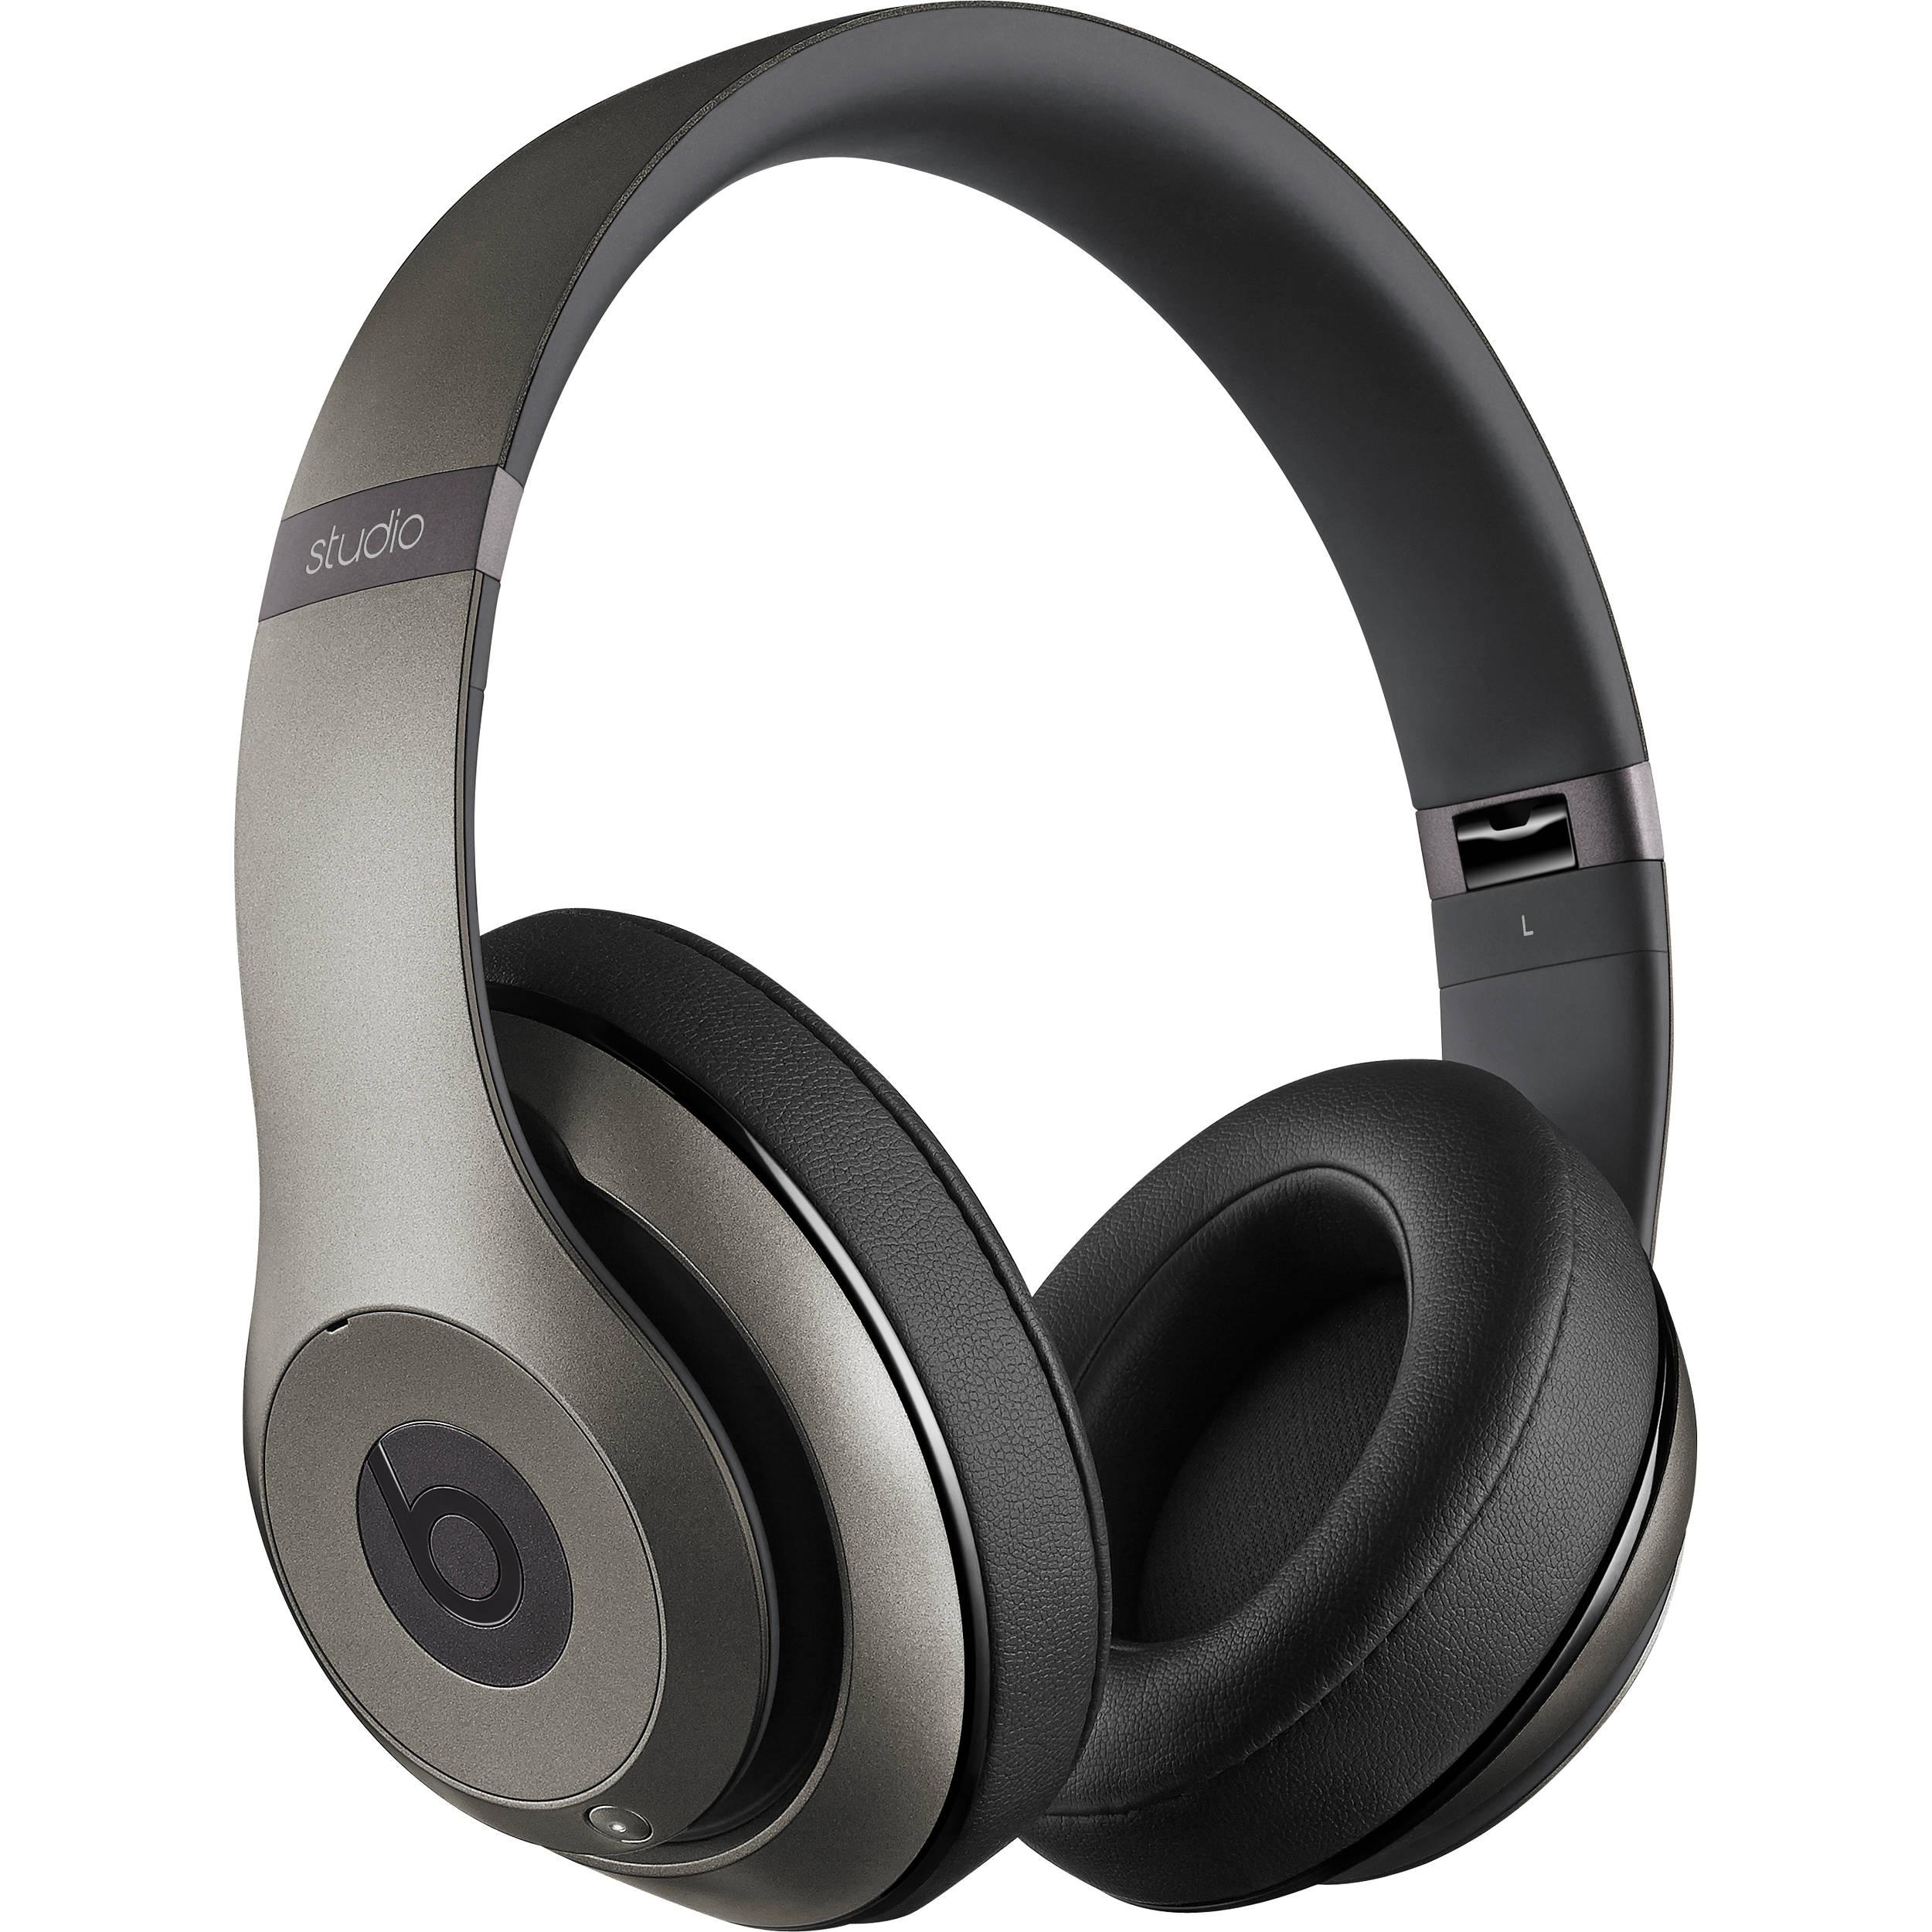 86714bb4270 beats_by_dr_dre_900_00199_01_studio_wireless_headphones_titanium_1016368.jpg